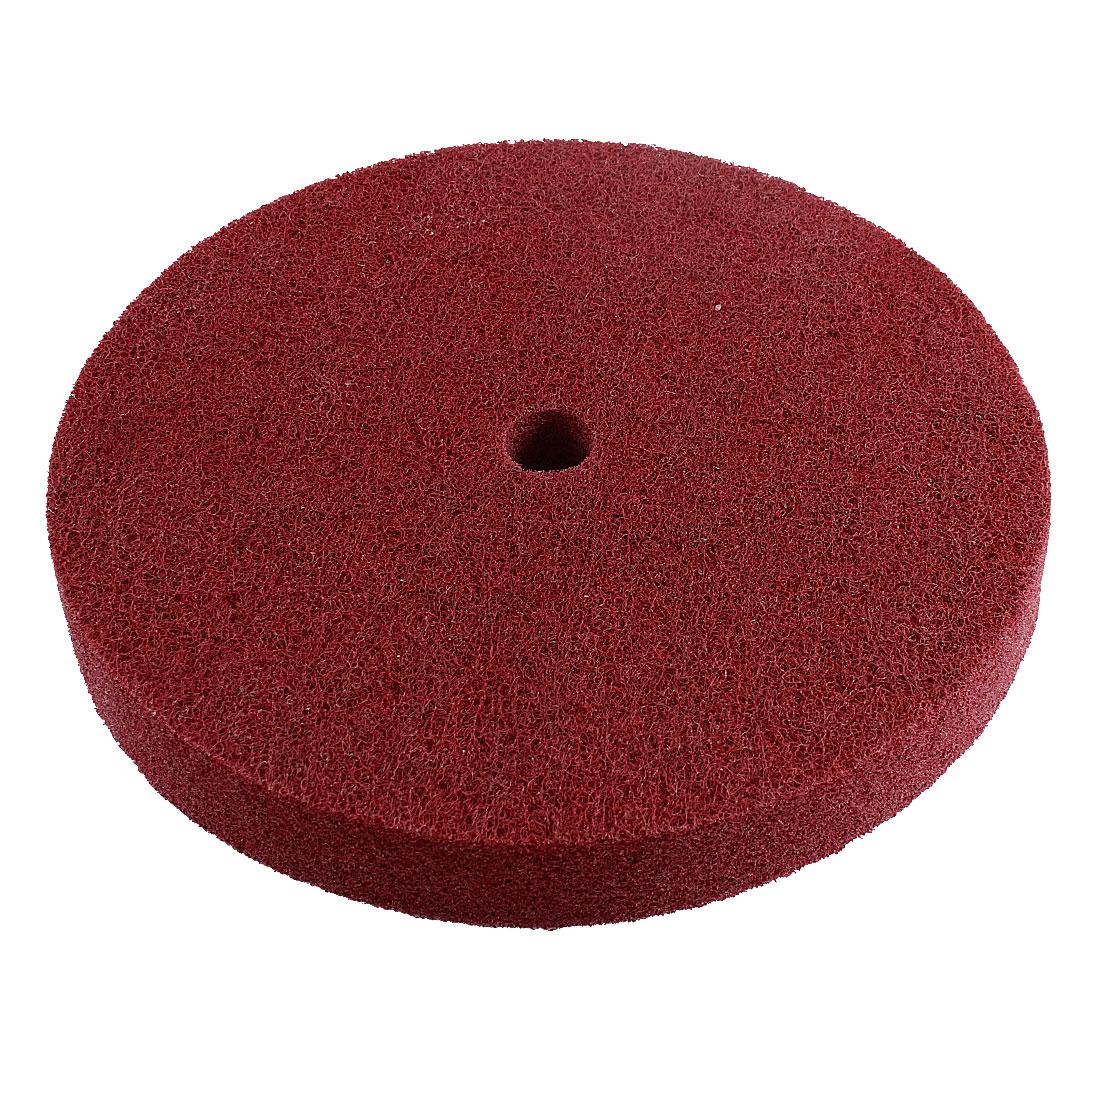 18 Hole Dia 180 Grit Nylon Fiber Wheel Abrasive Polishing Buffing Dark Red